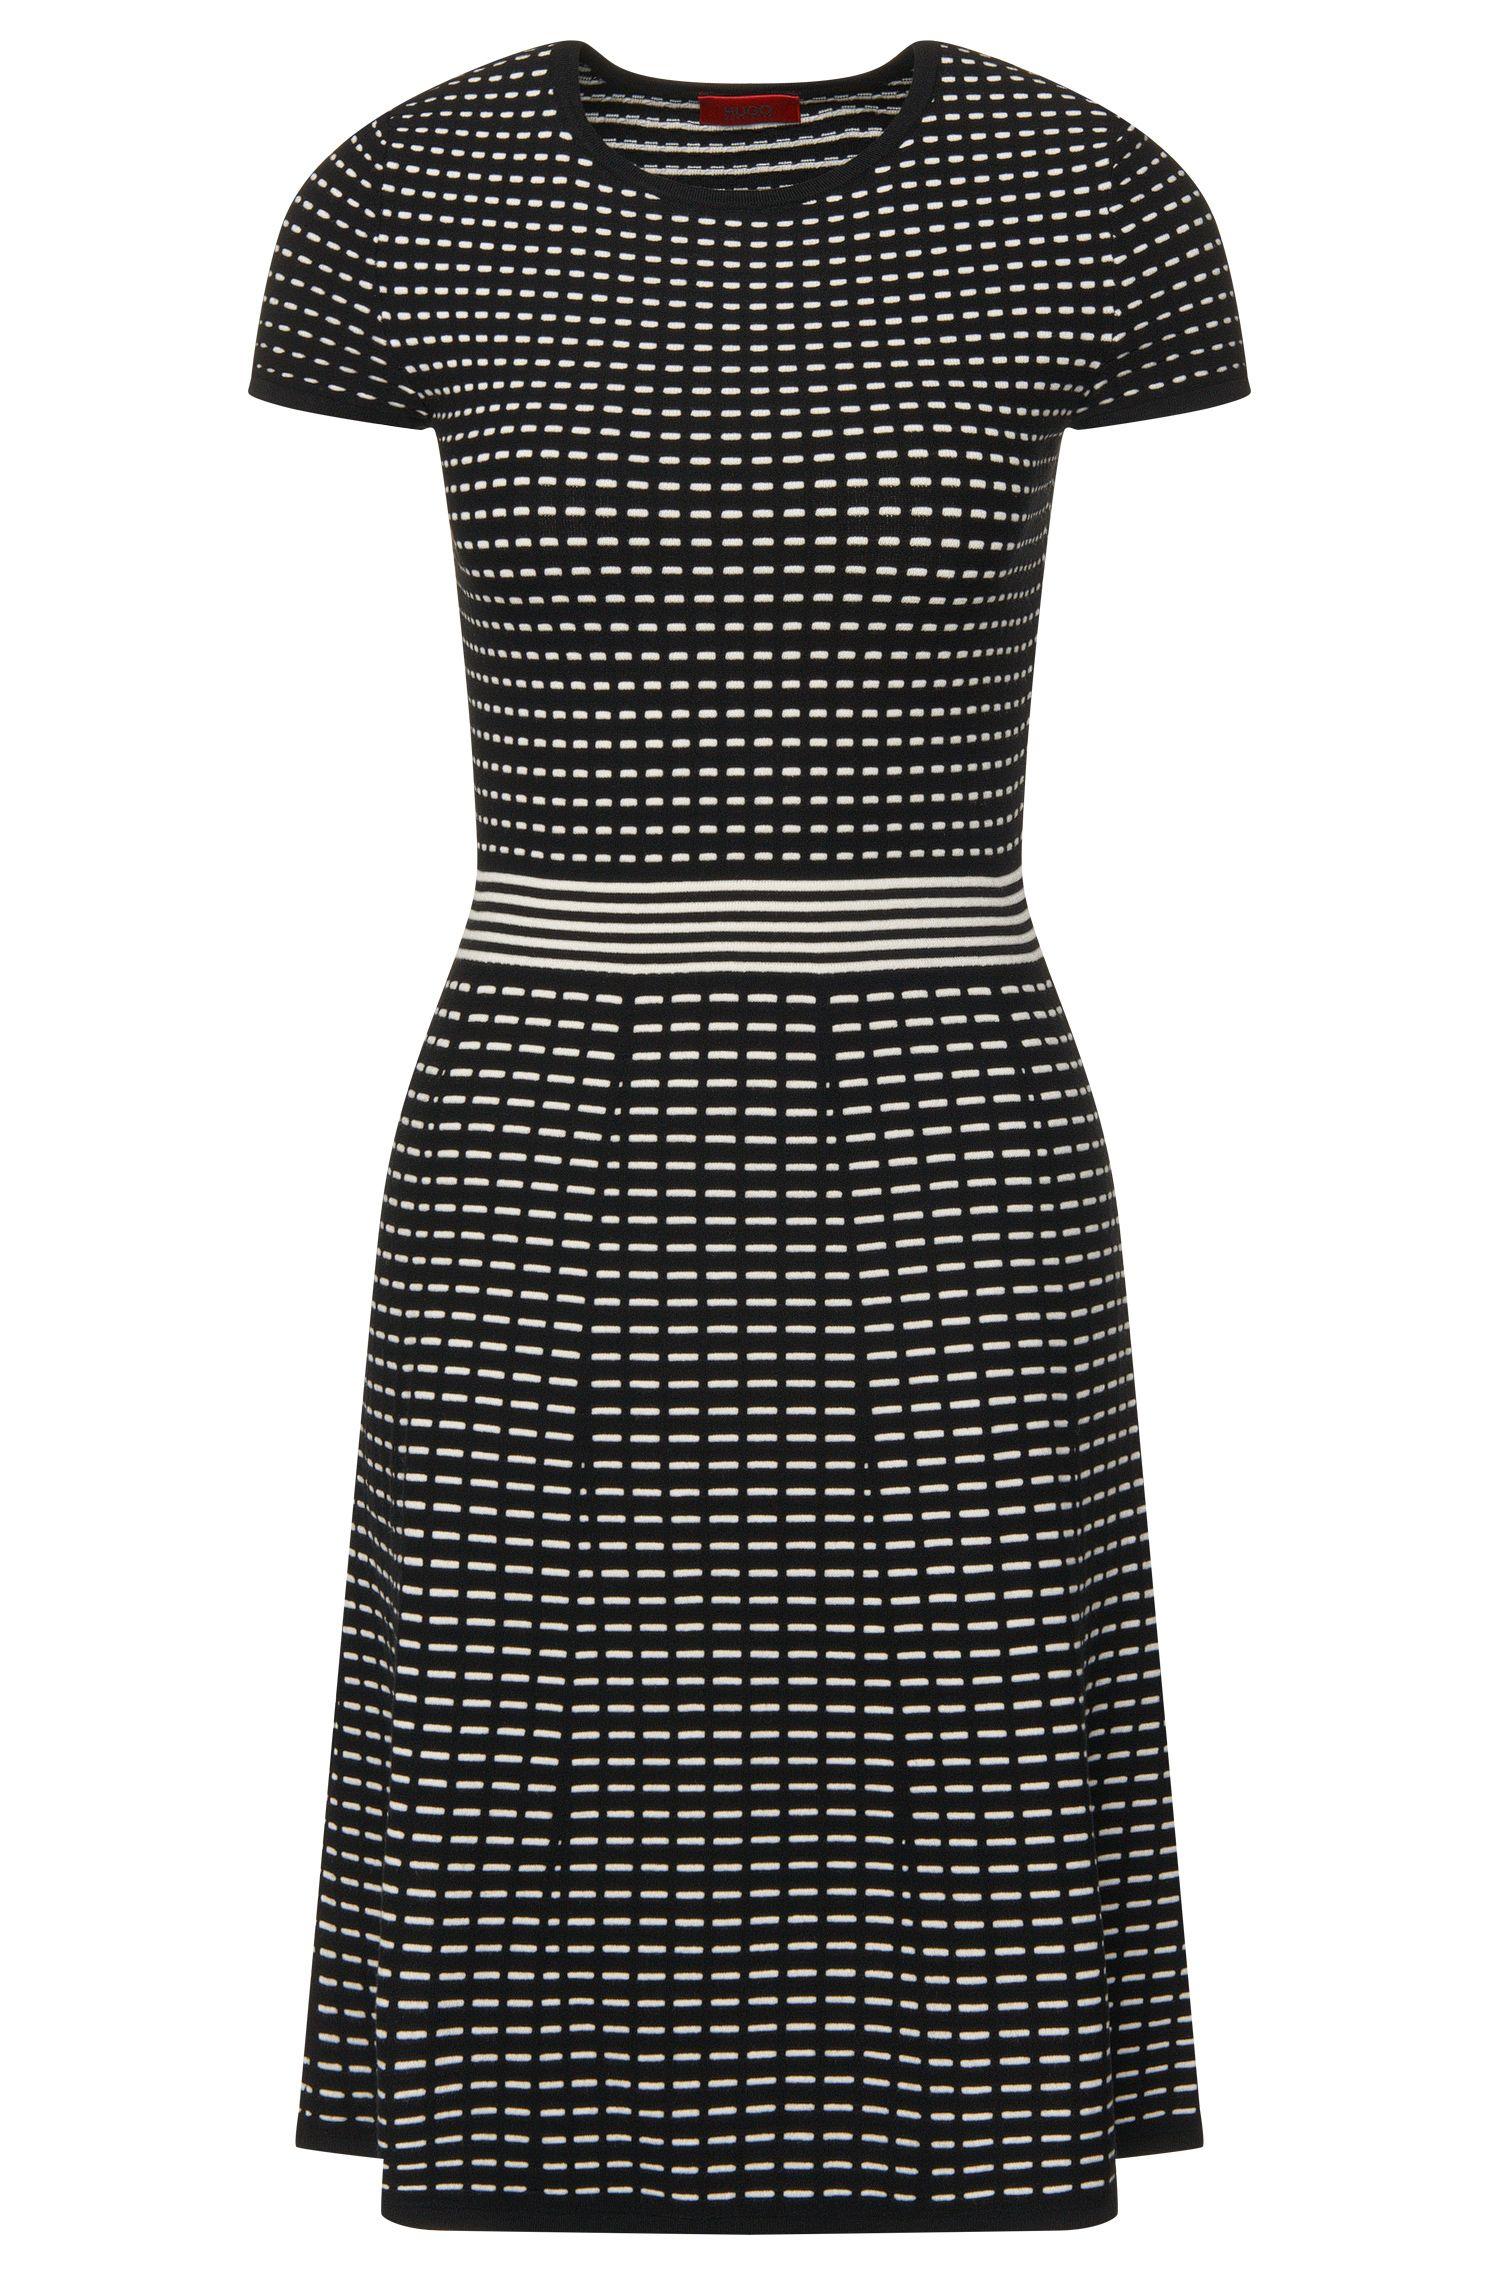 Striped knitwear dress in viscose blend: 'Sadinia'